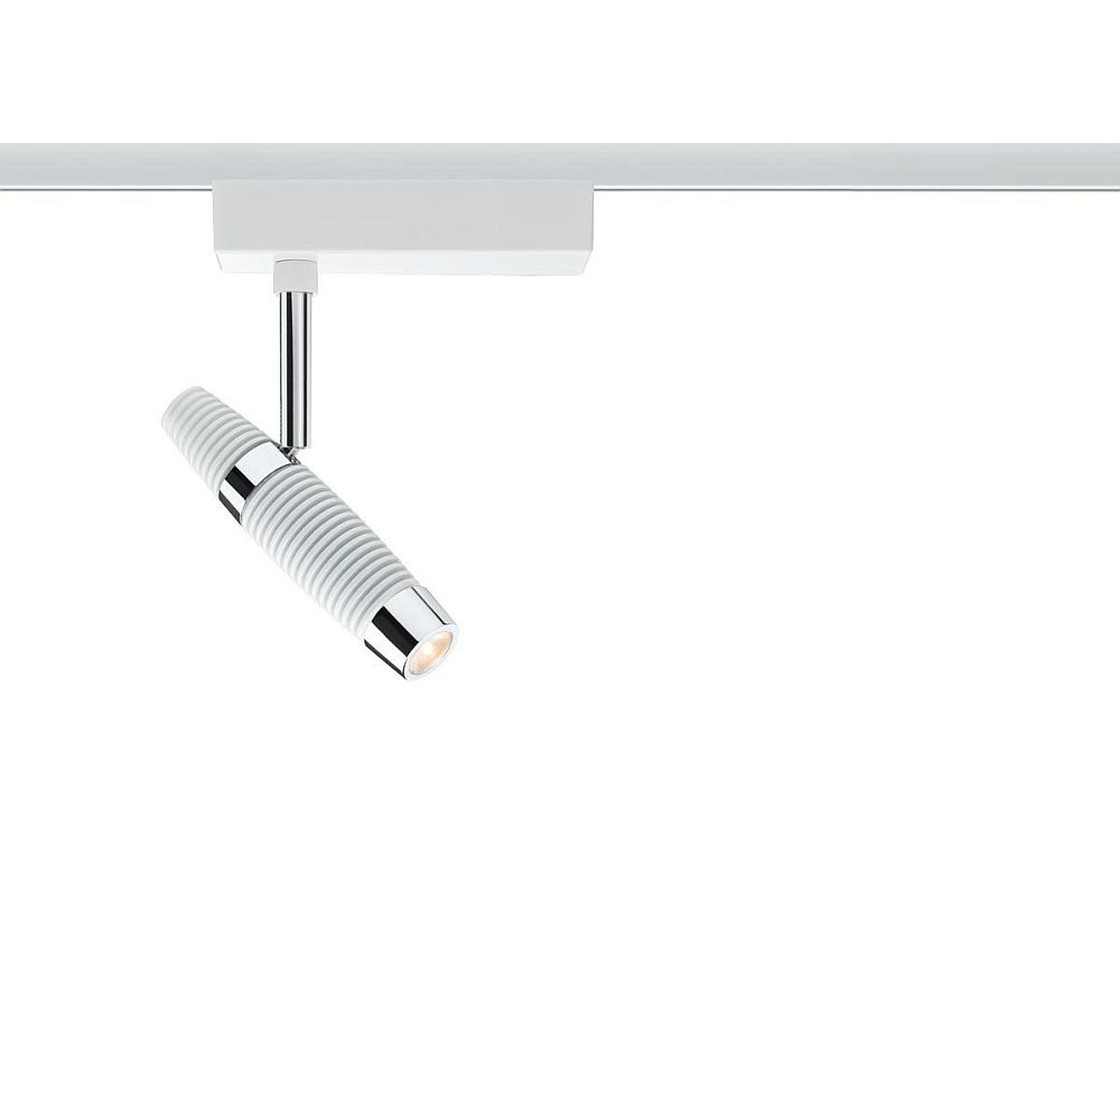 Paulmann urail channel led strahler 10 w wei for Lampen rampe